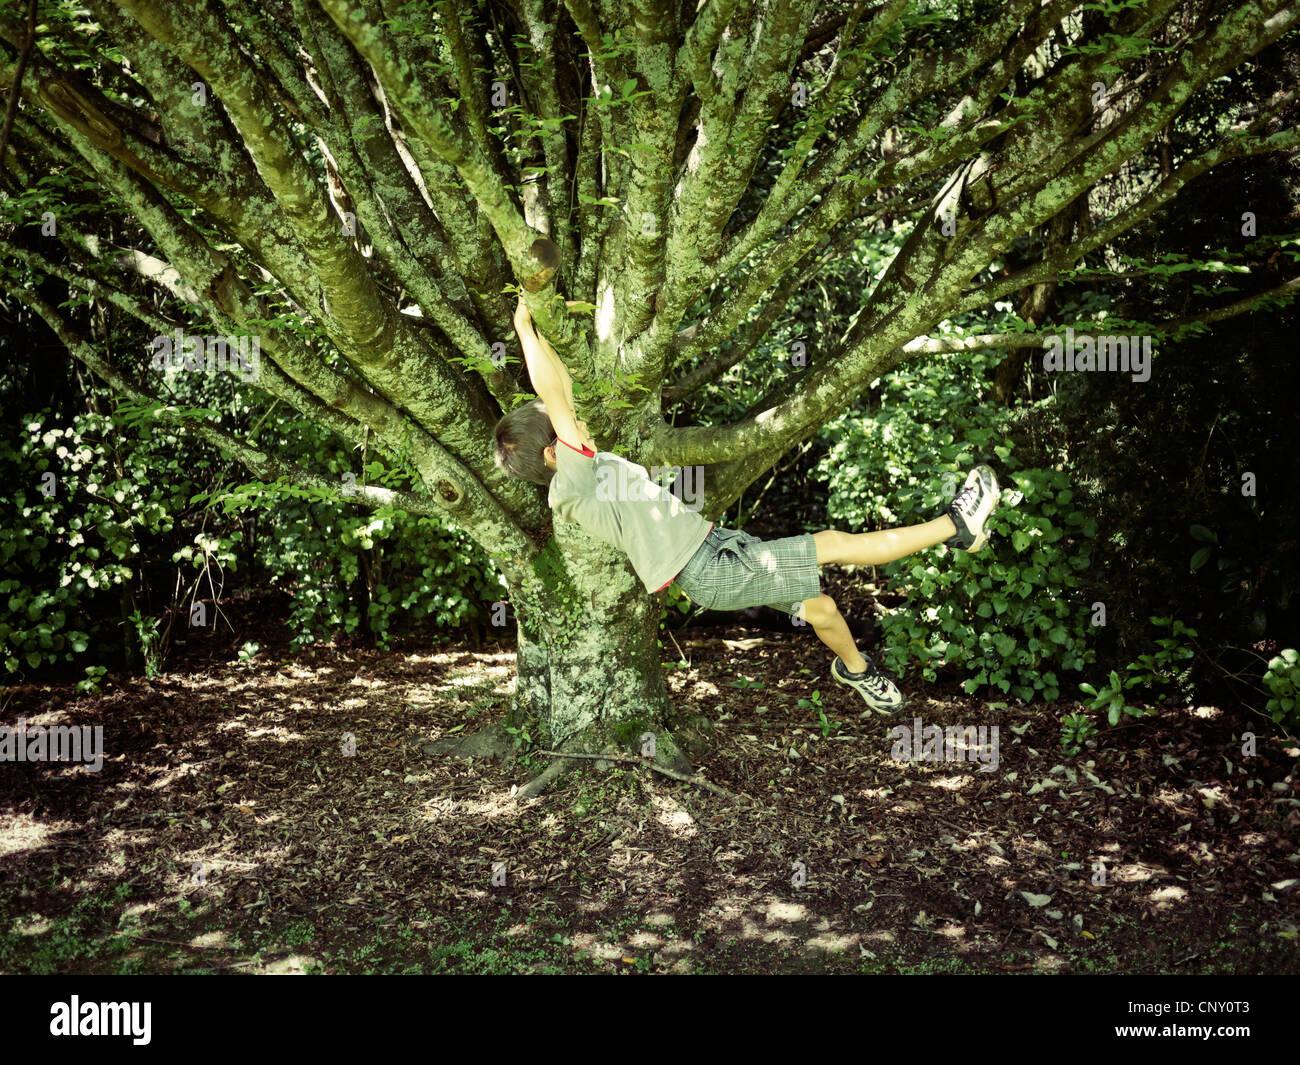 Boy baloiços ramo de árvore. Imagens de Stock